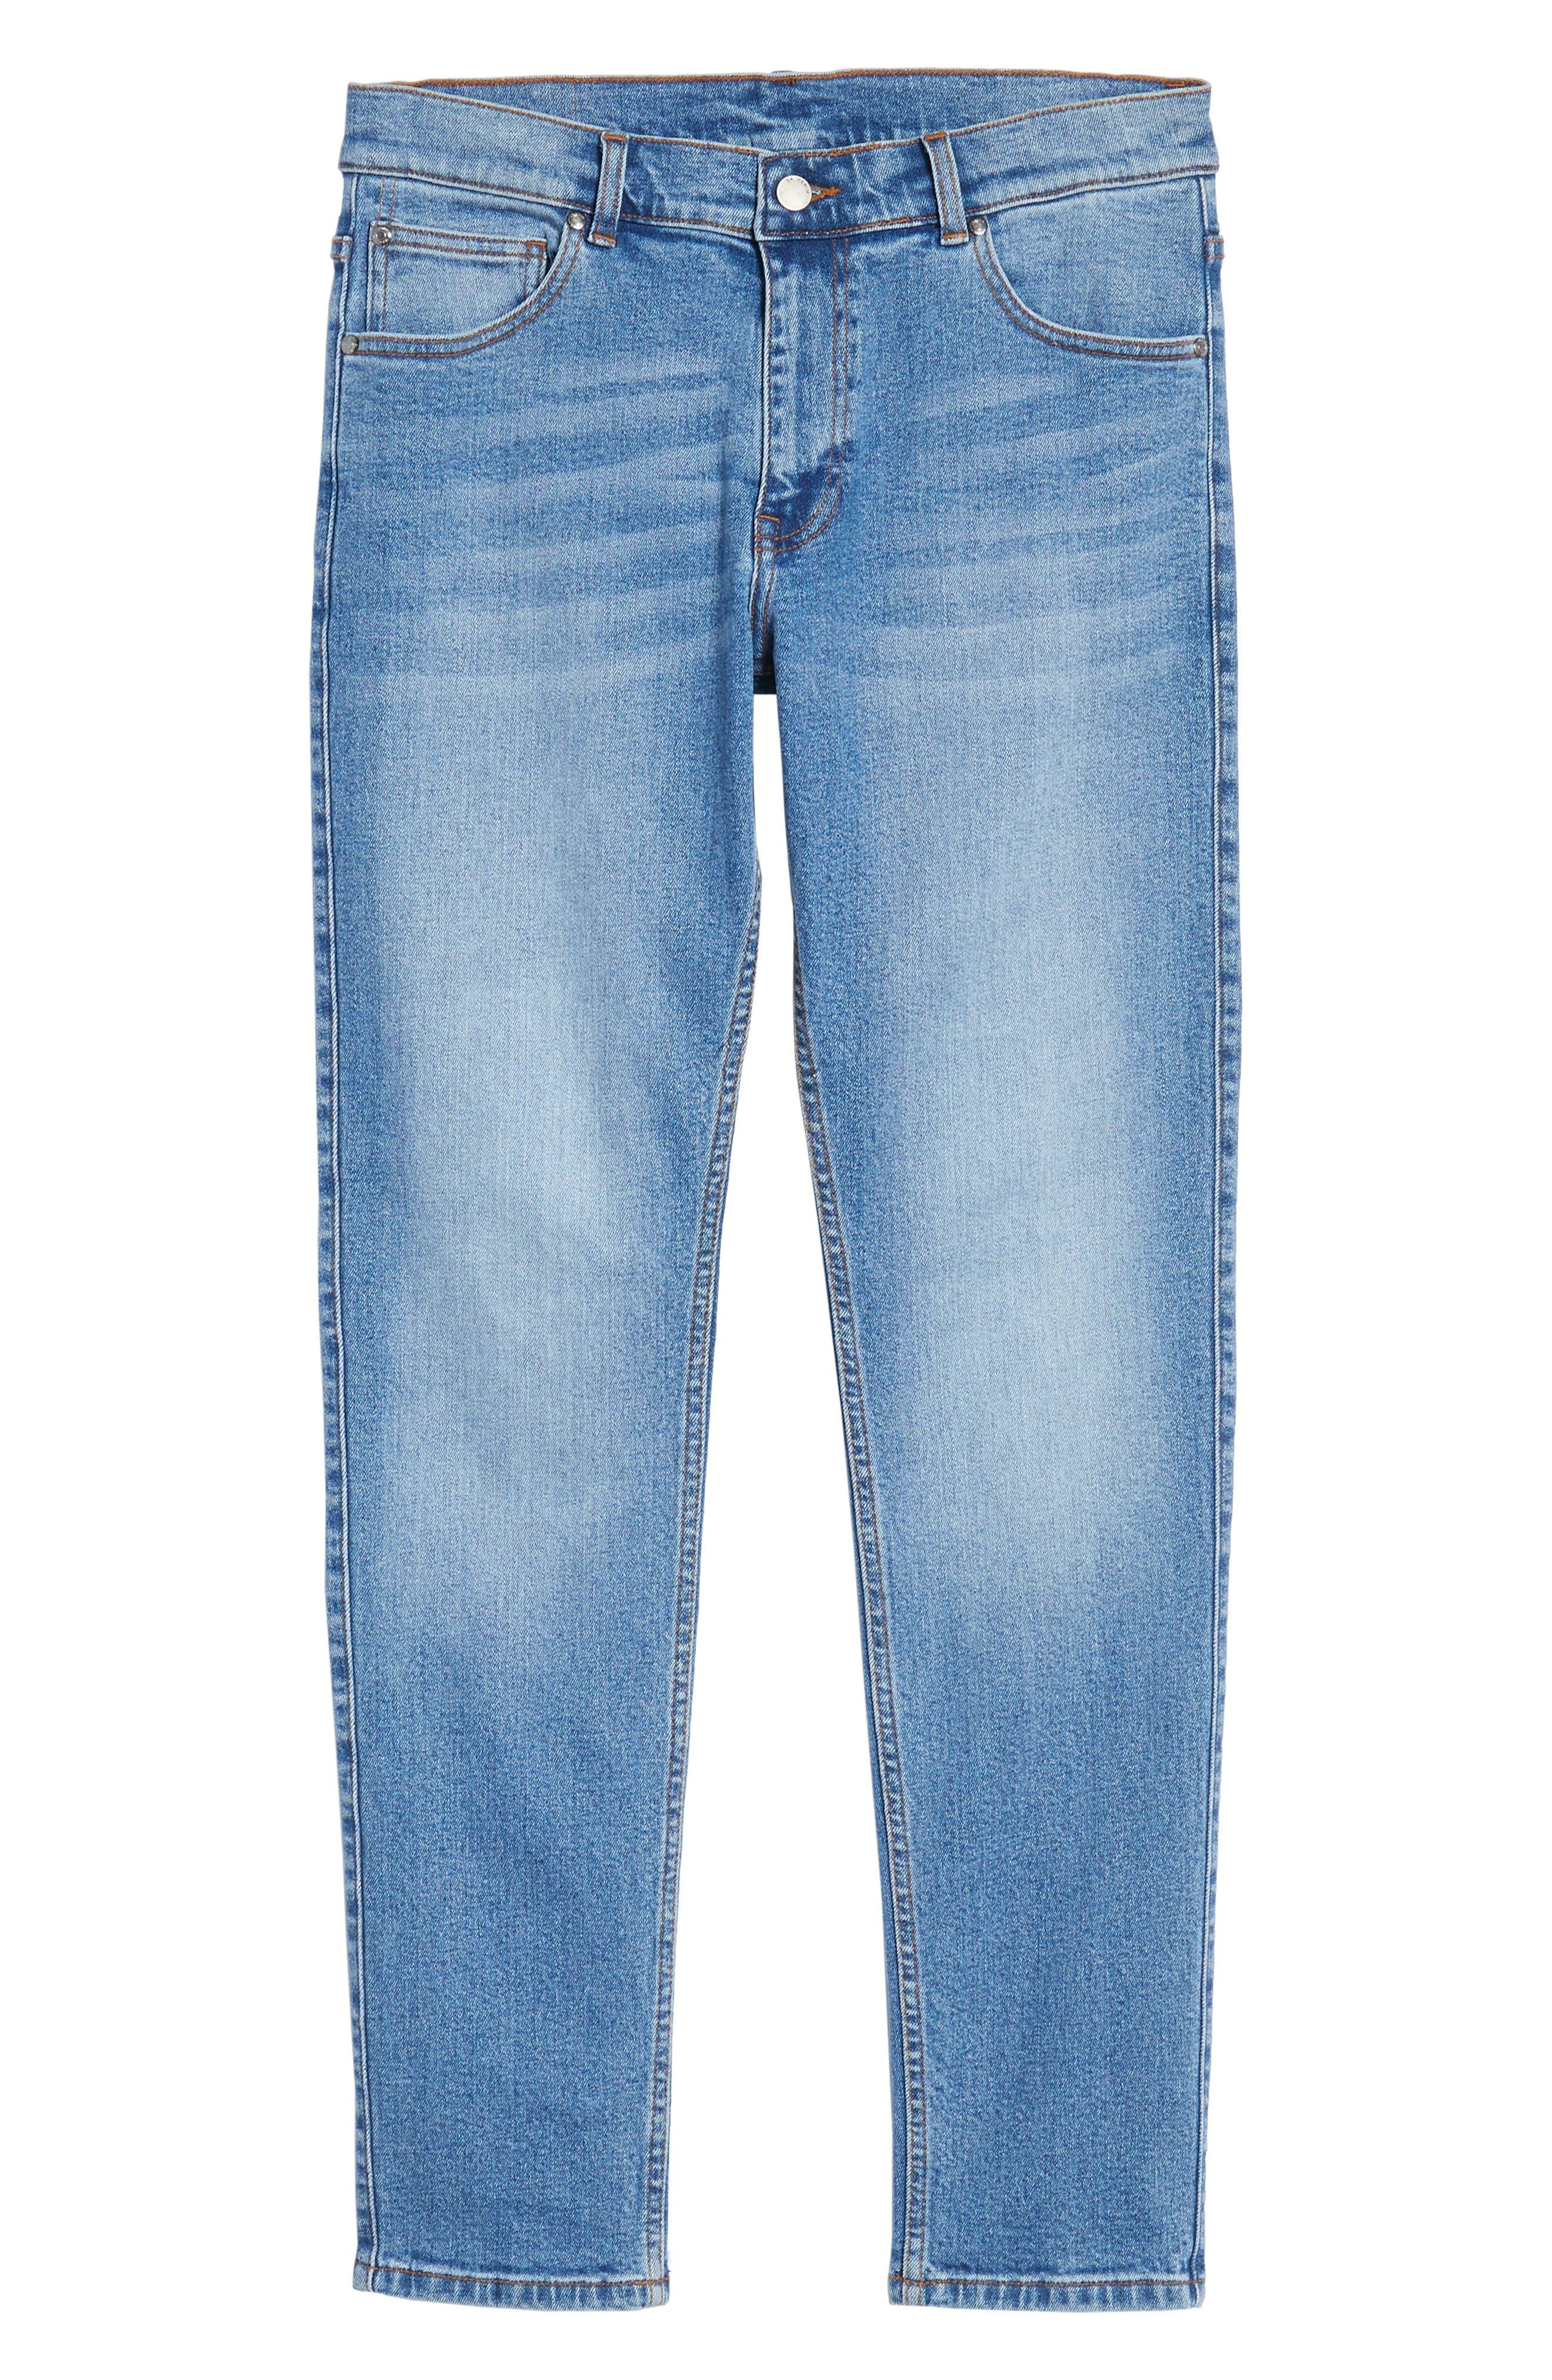 Clark Slim Straight Leg Jeans,                             Alternate thumbnail 6, color,                             Shaded Mid Blue